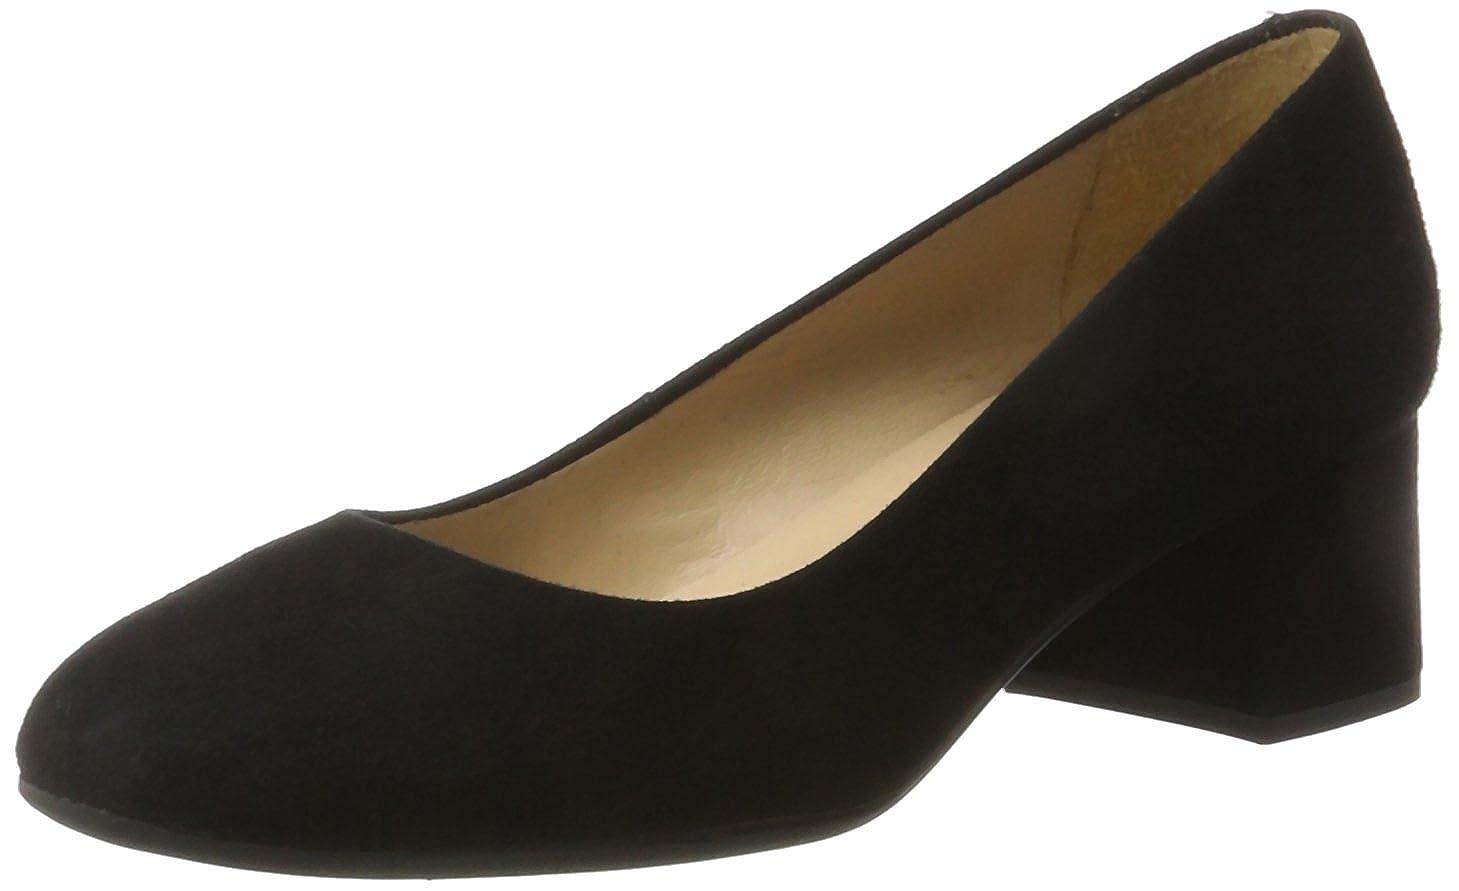 TALLA 37 EU. Unisa Kumer_f17_KS, Zapatos de Tacón para Mujer